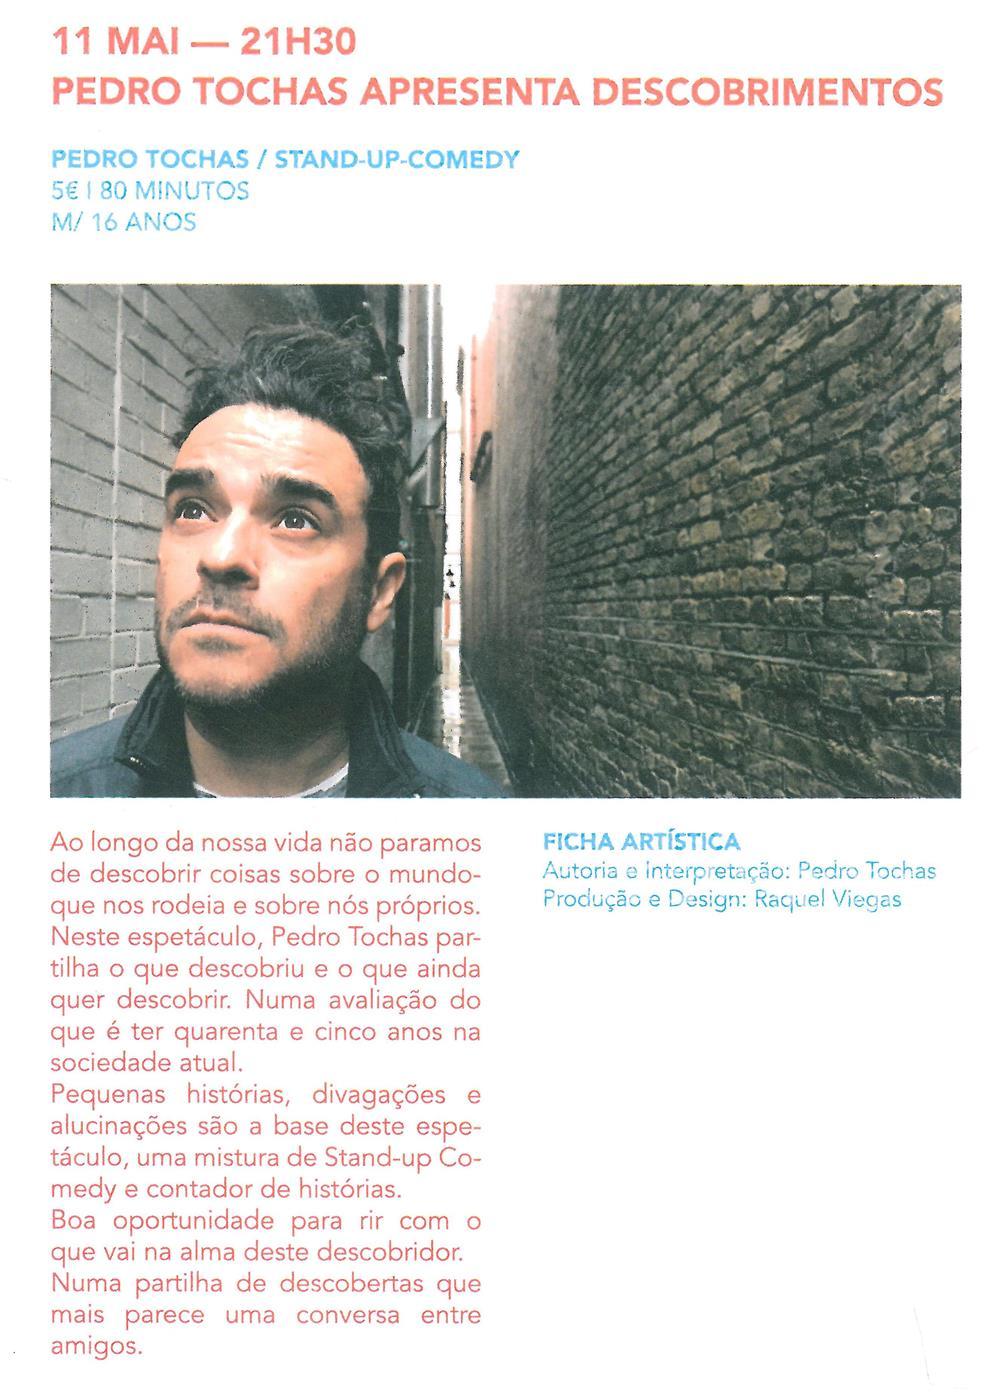 AgCultCAE-01abr.'19-p.15-Pedro Tochas apresenta Descobrimentos.jpg